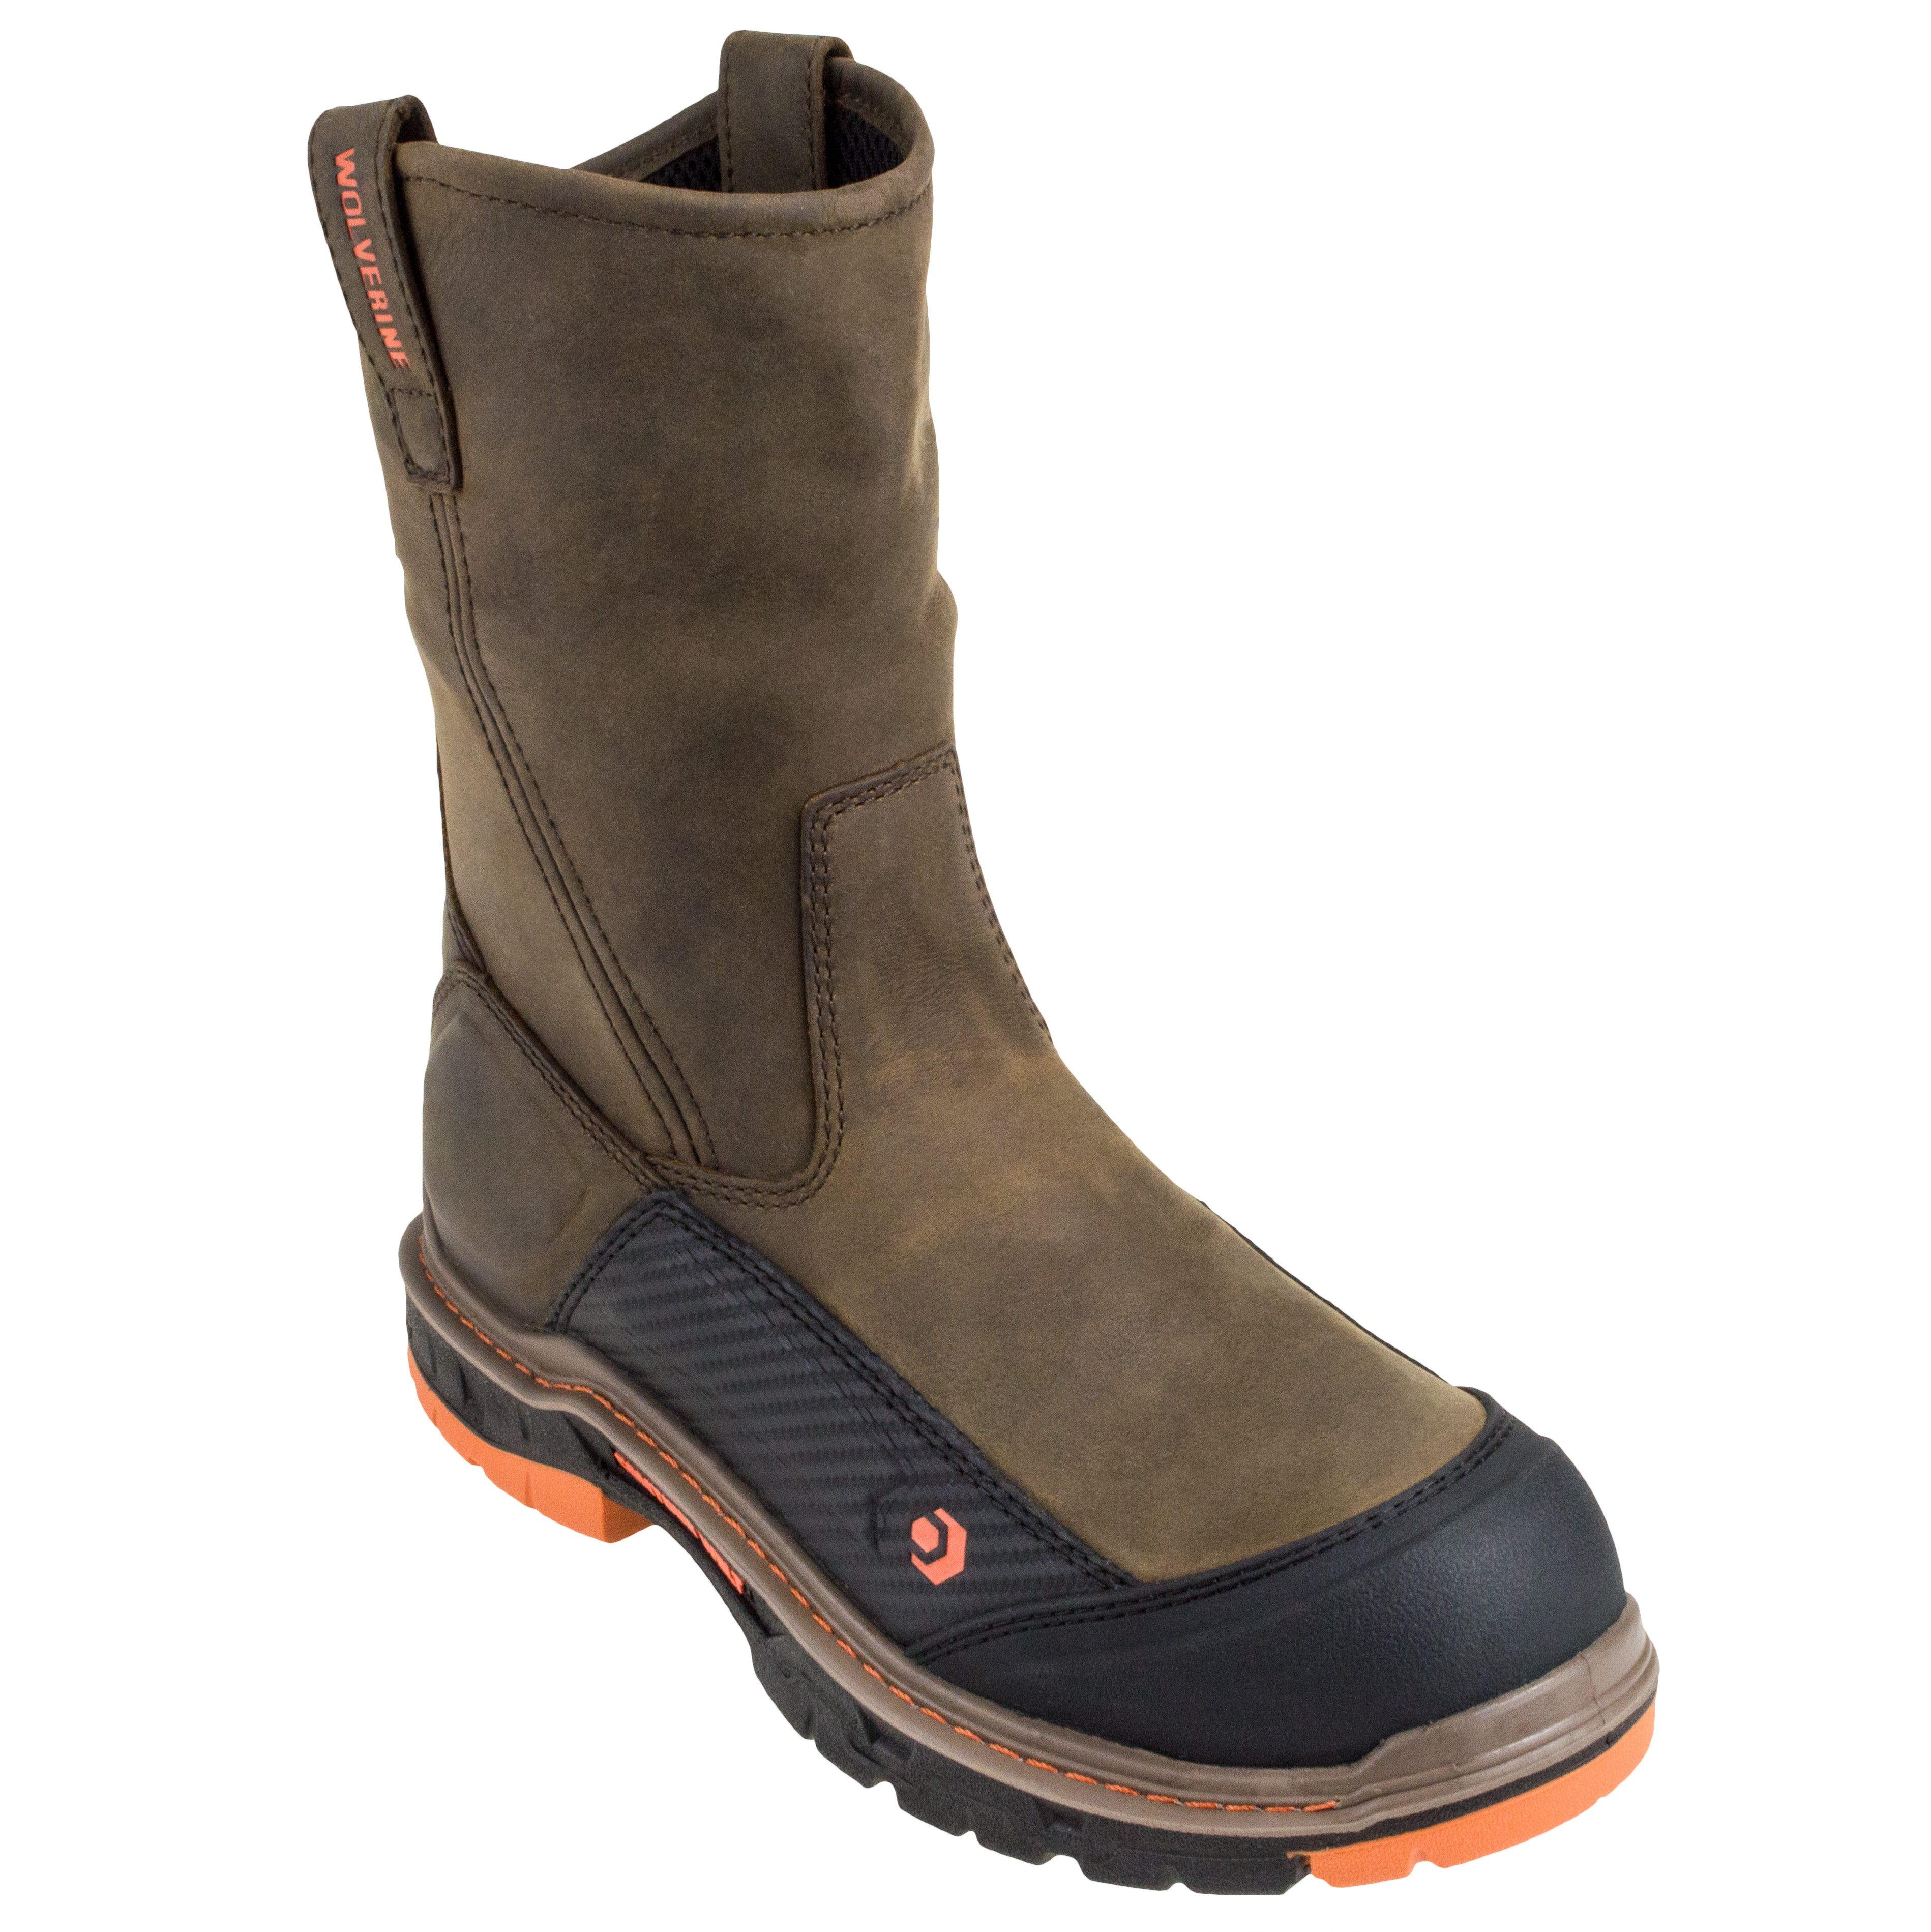 Thorogood 6 Inch Plain Steel Toe Brown Work Boots 804-3366 USA